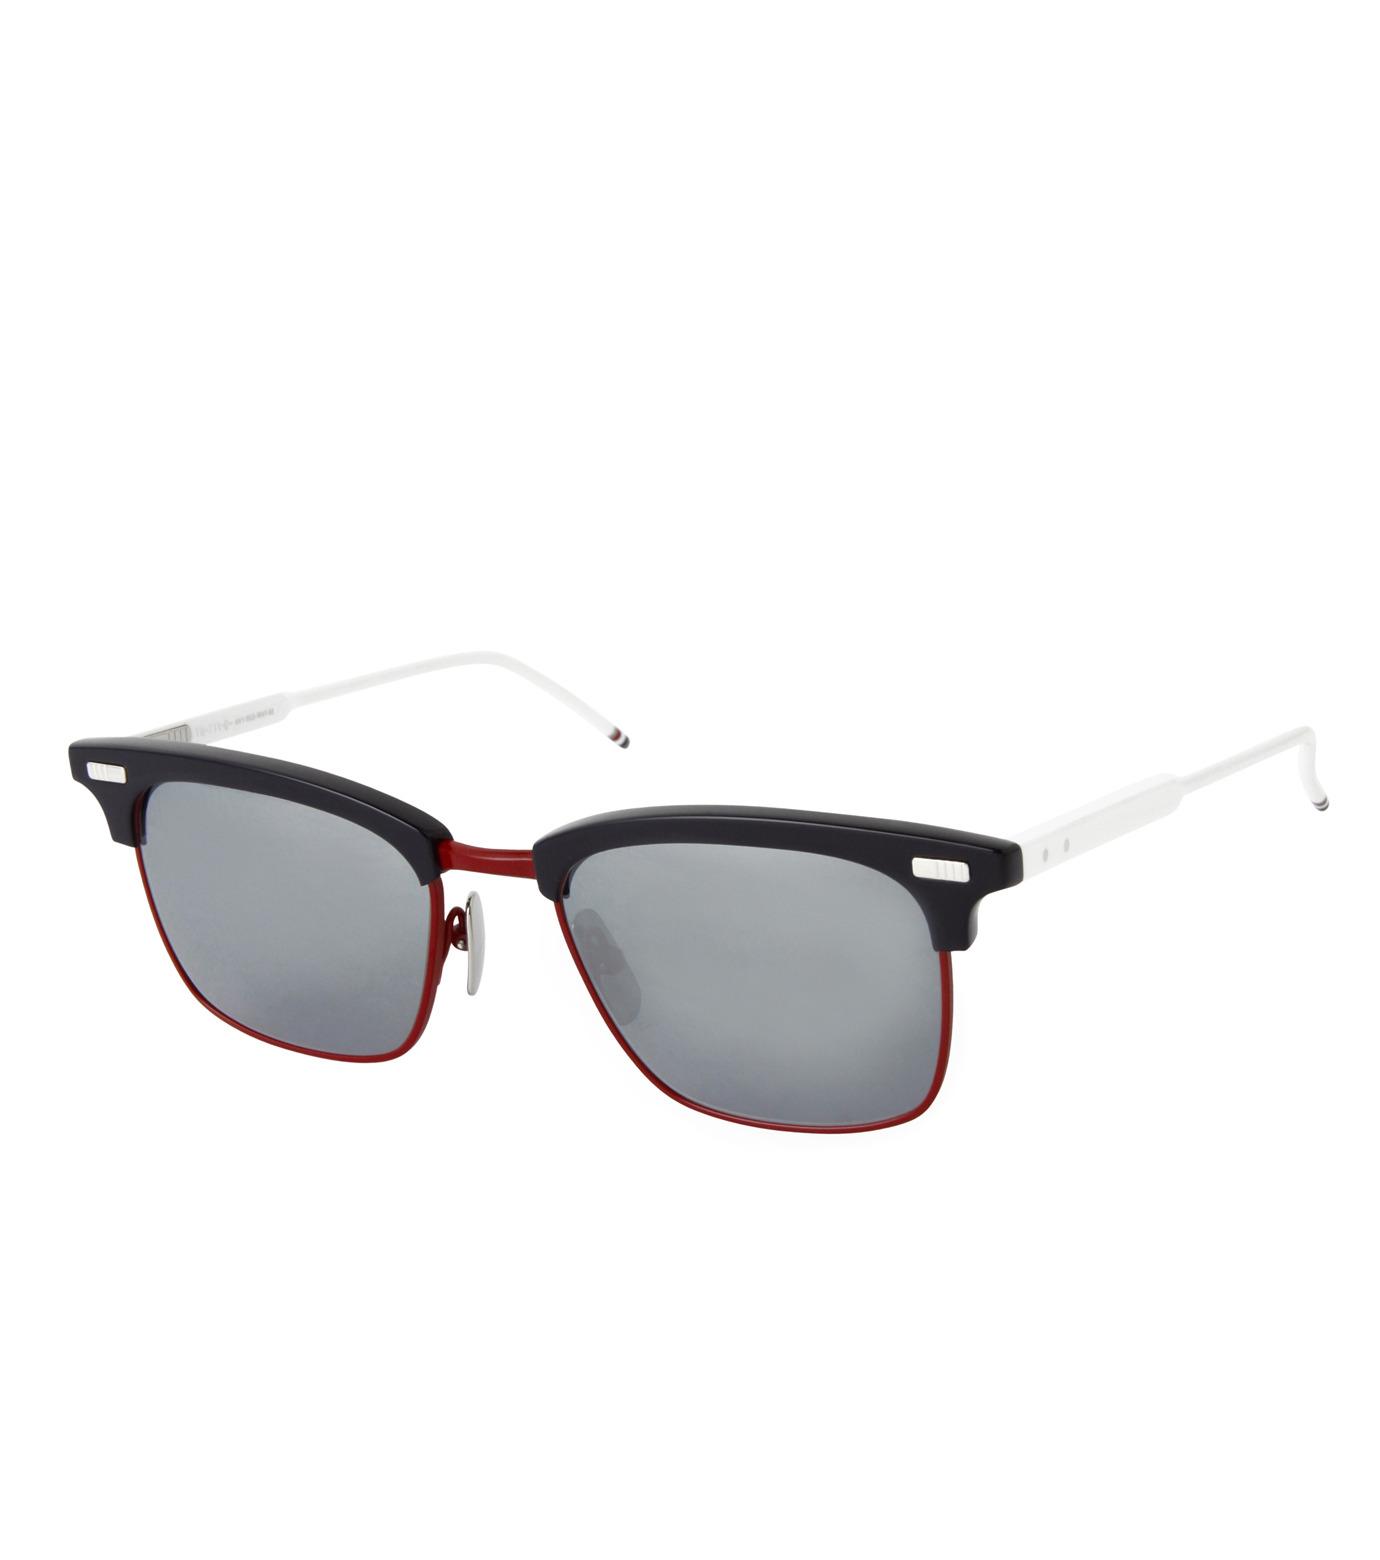 Thom Browne Eye Wear(トム・ブラウン・アイウェア)のtricolore wellington-NAVY(アイウェア/eyewear)-TB-711-D-93 拡大詳細画像1